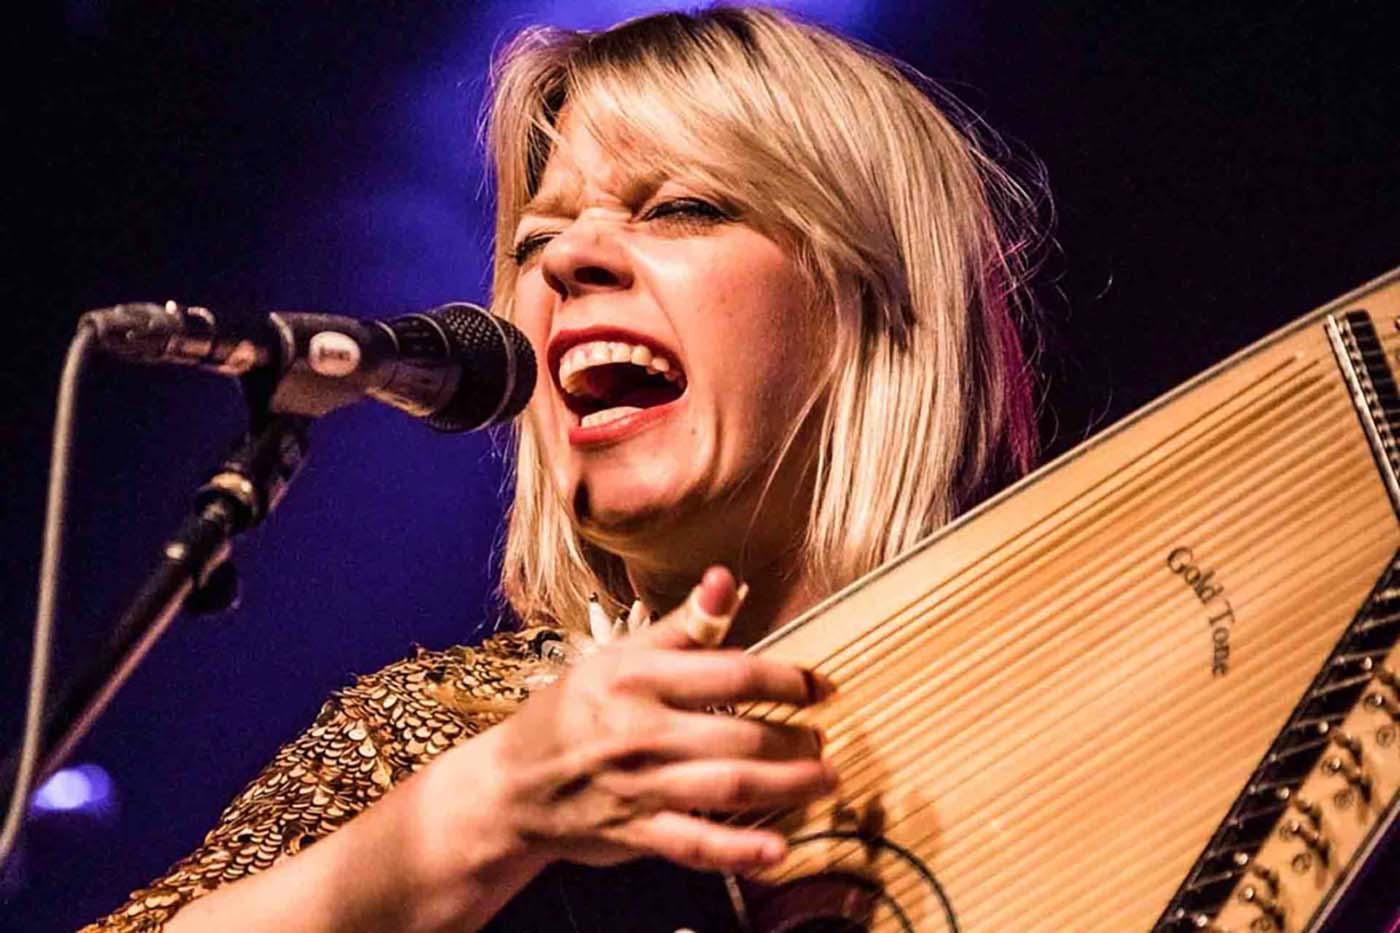 Concert Fotografie, Basia-Bulat-Rotown-Rotterdam